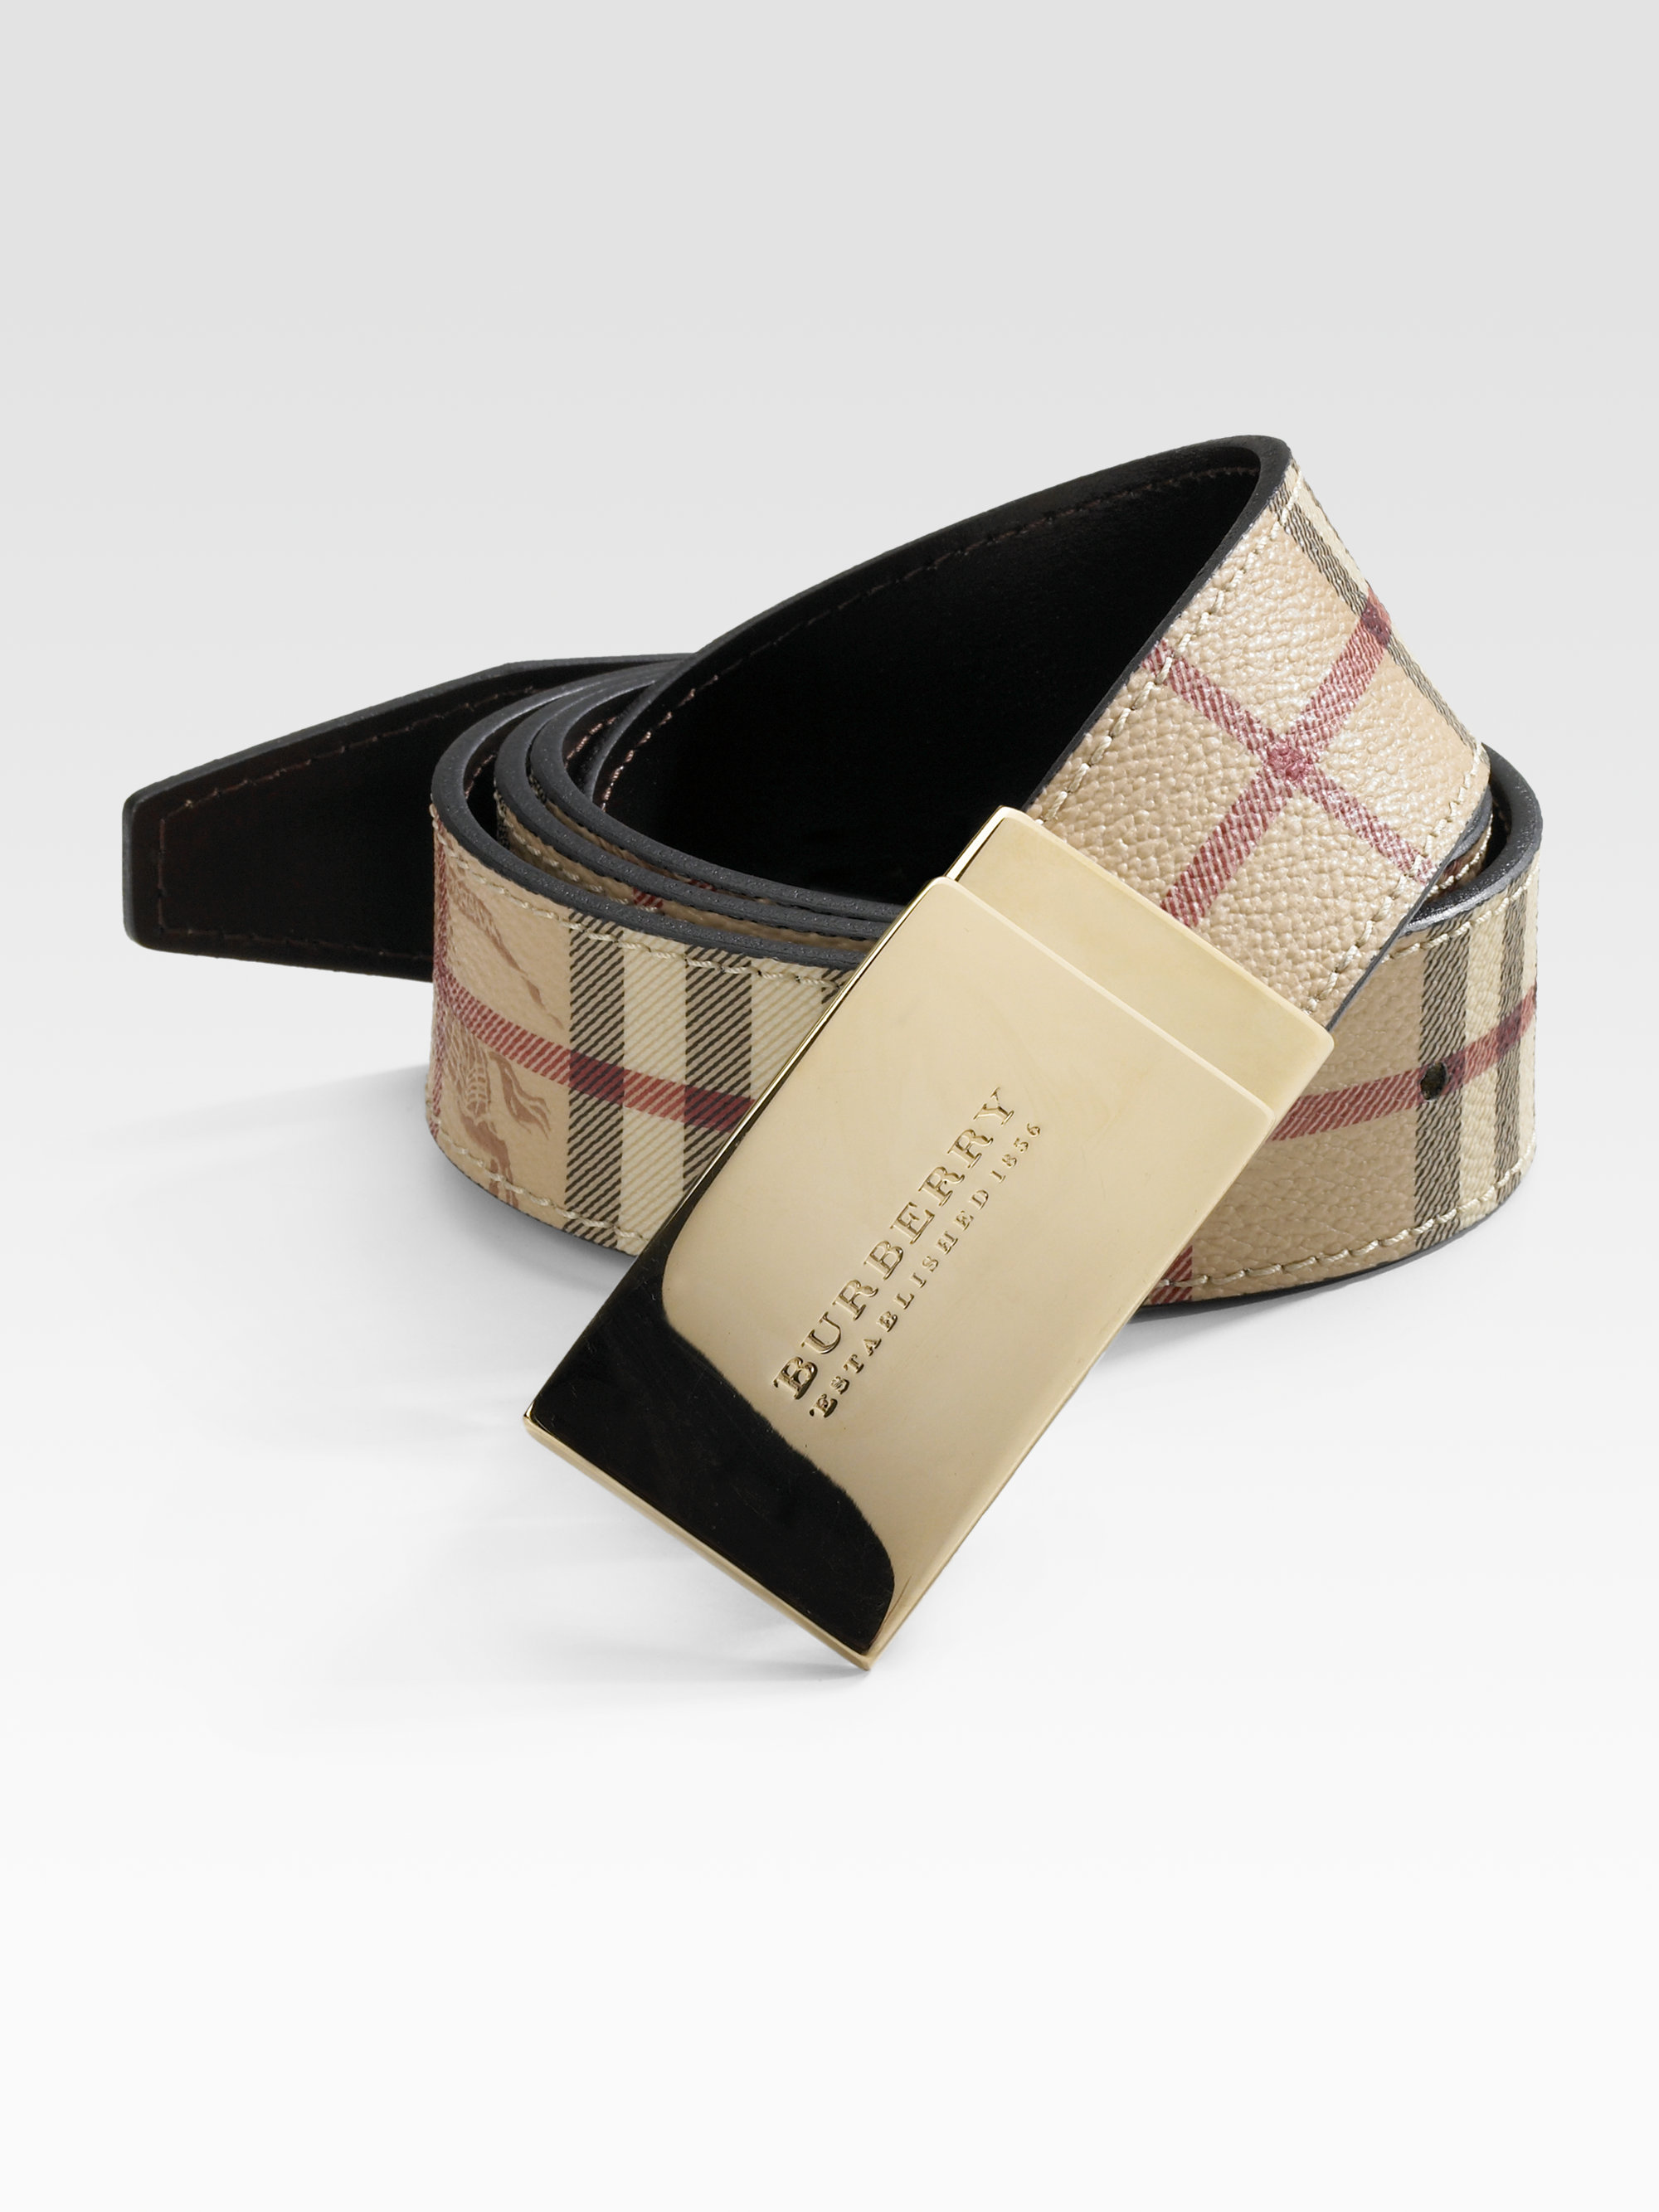 Lyst - Burberry Signature Belt in Brown for Men 3acbbec5501